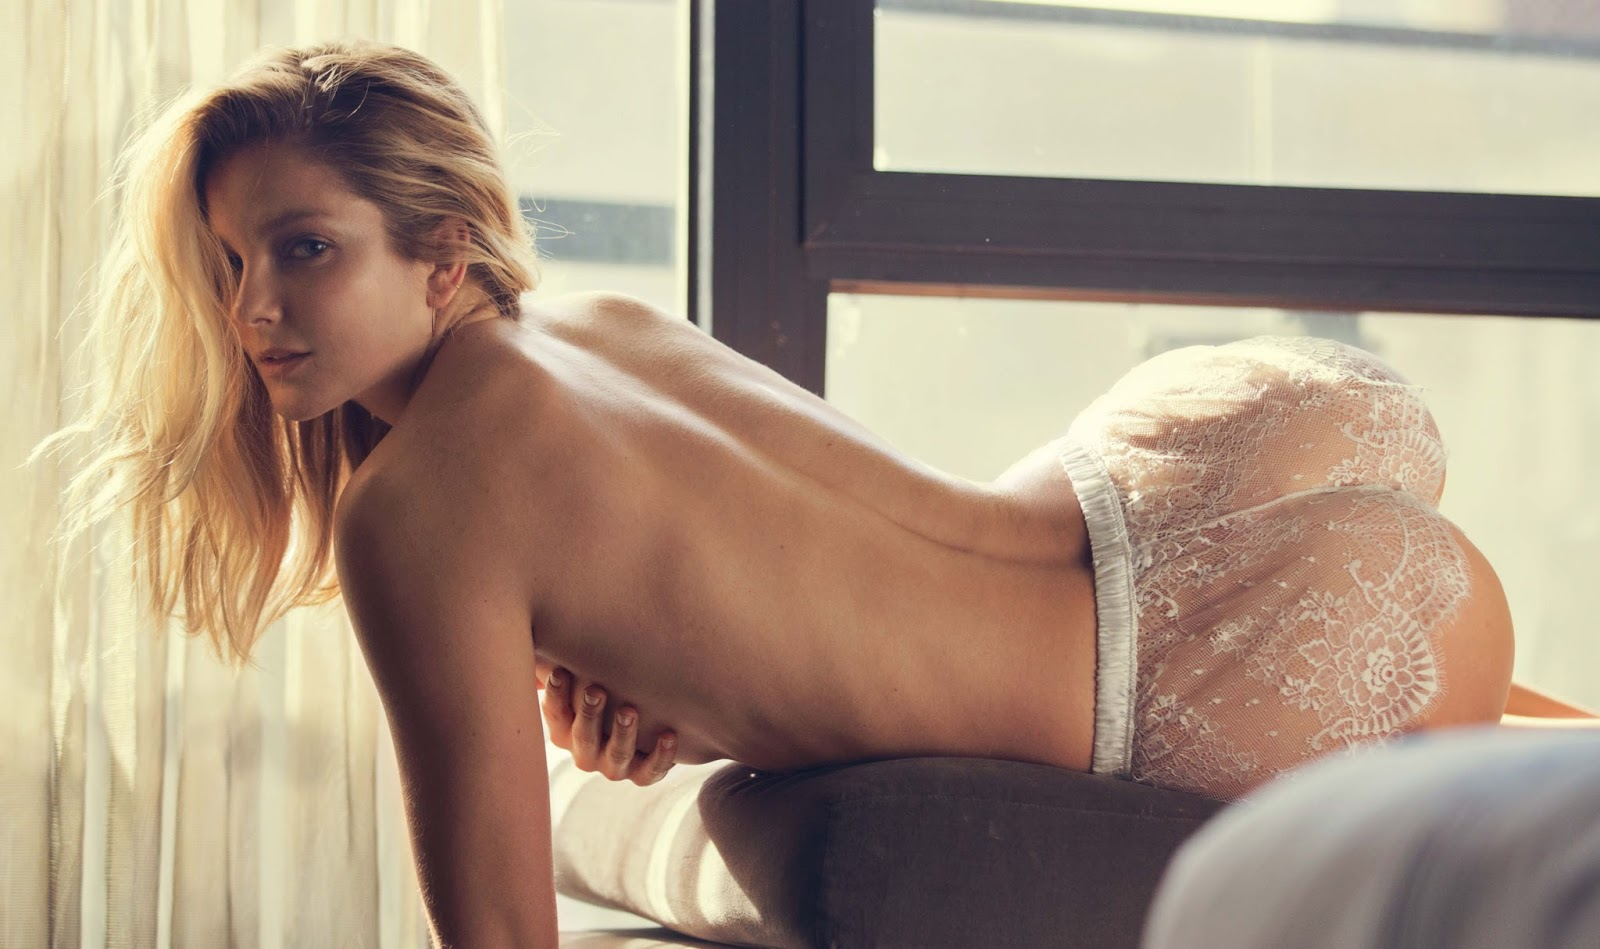 Ana Carolina Playboy eniko mihalik in playboy usa december 2016david bellemere